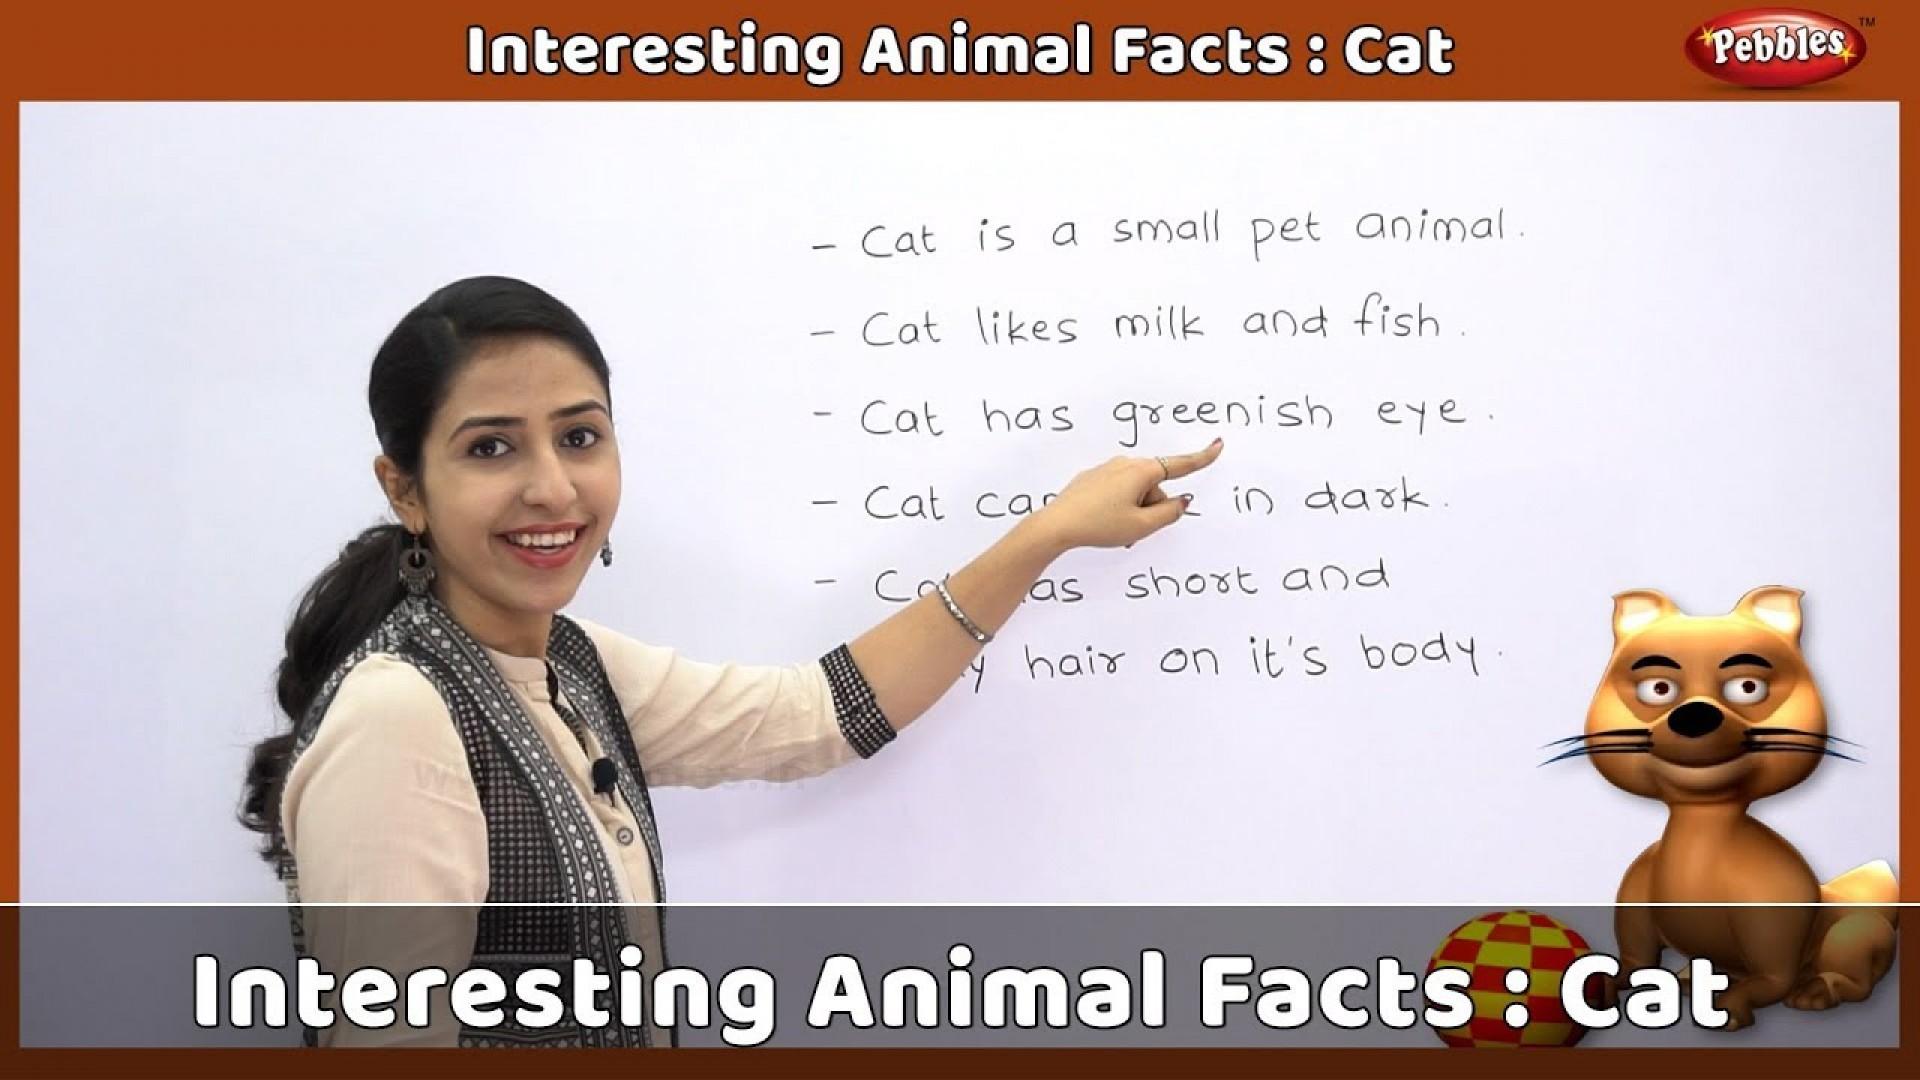 004 Cat Essay Maxresdefault Shocking In English For Class 6 On Hindi 3 Information Marathi 1920